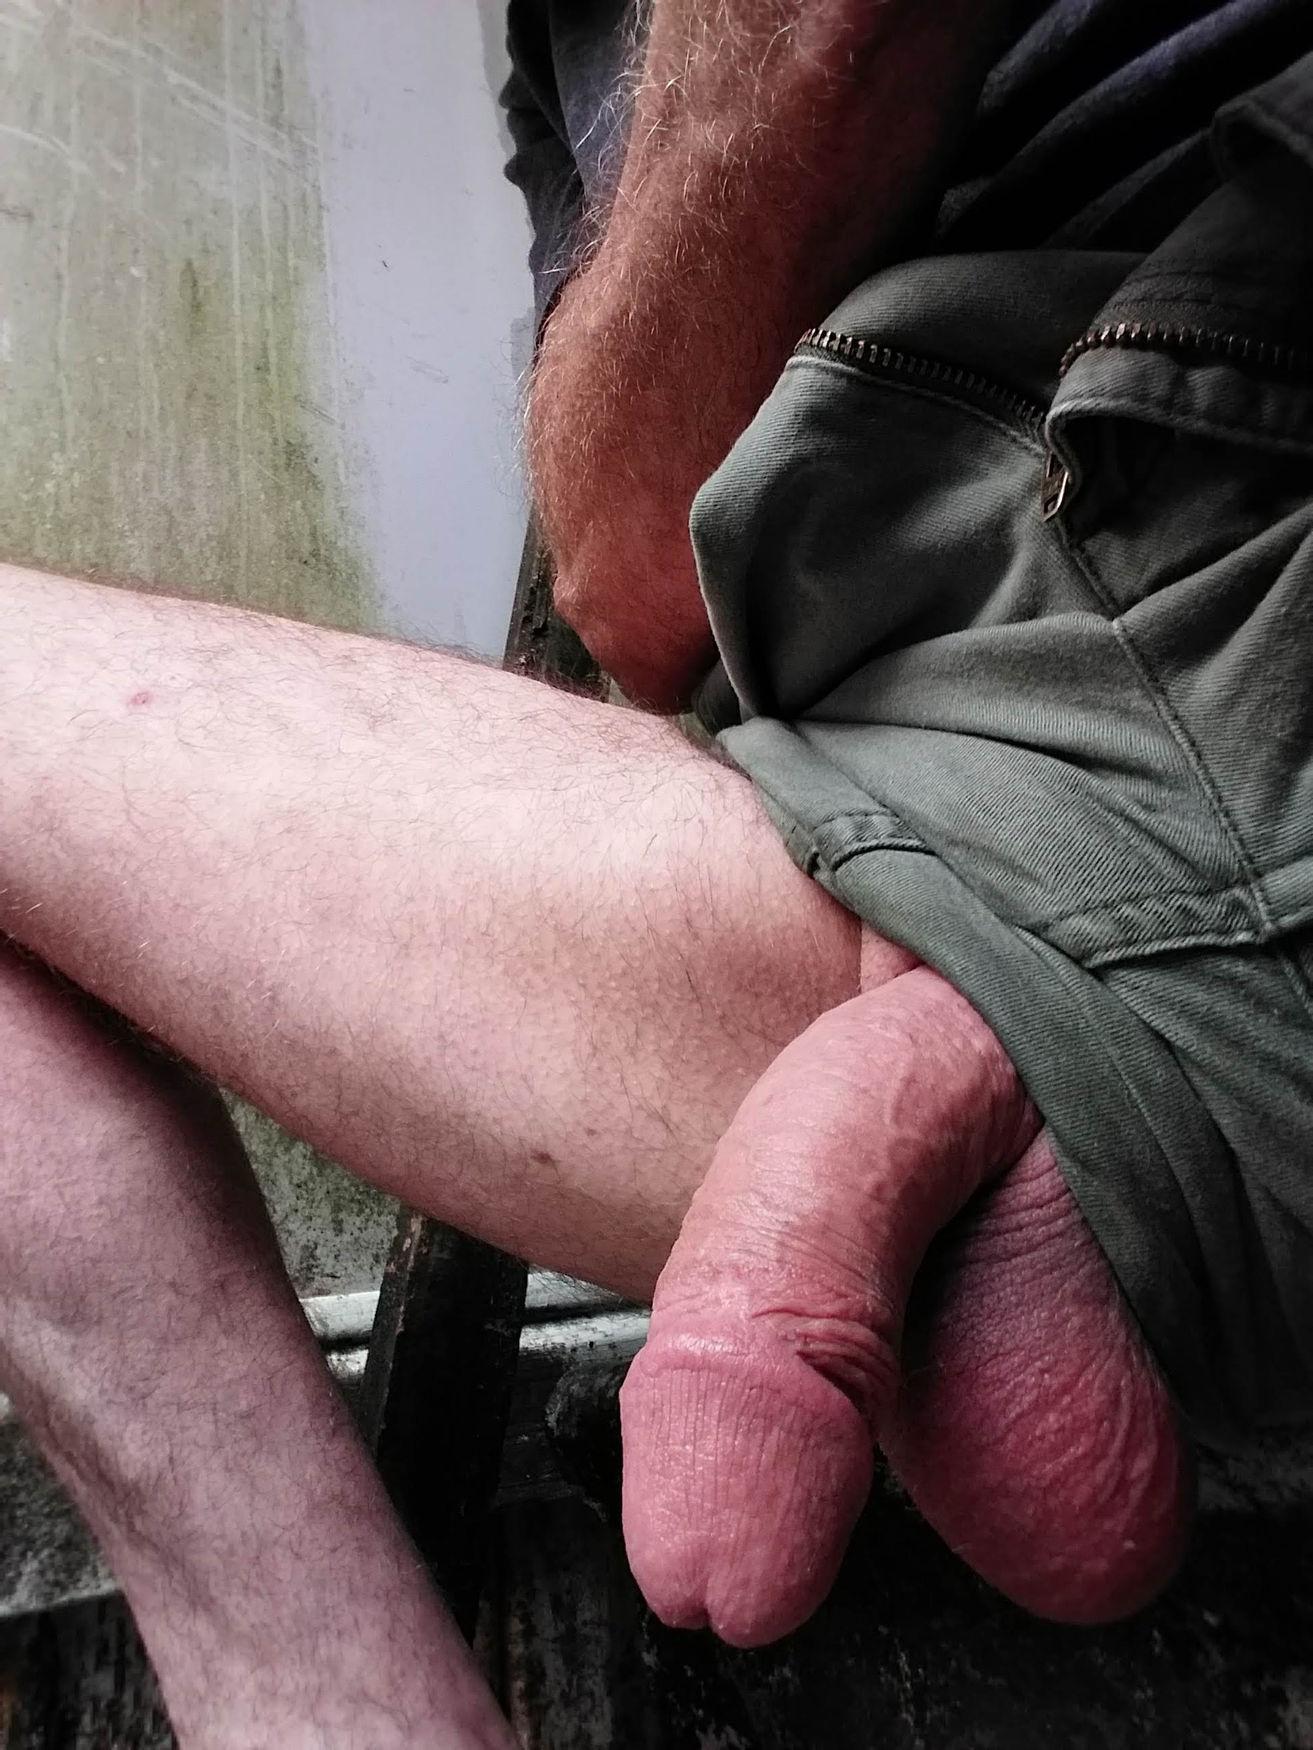 Hanging around outdoors